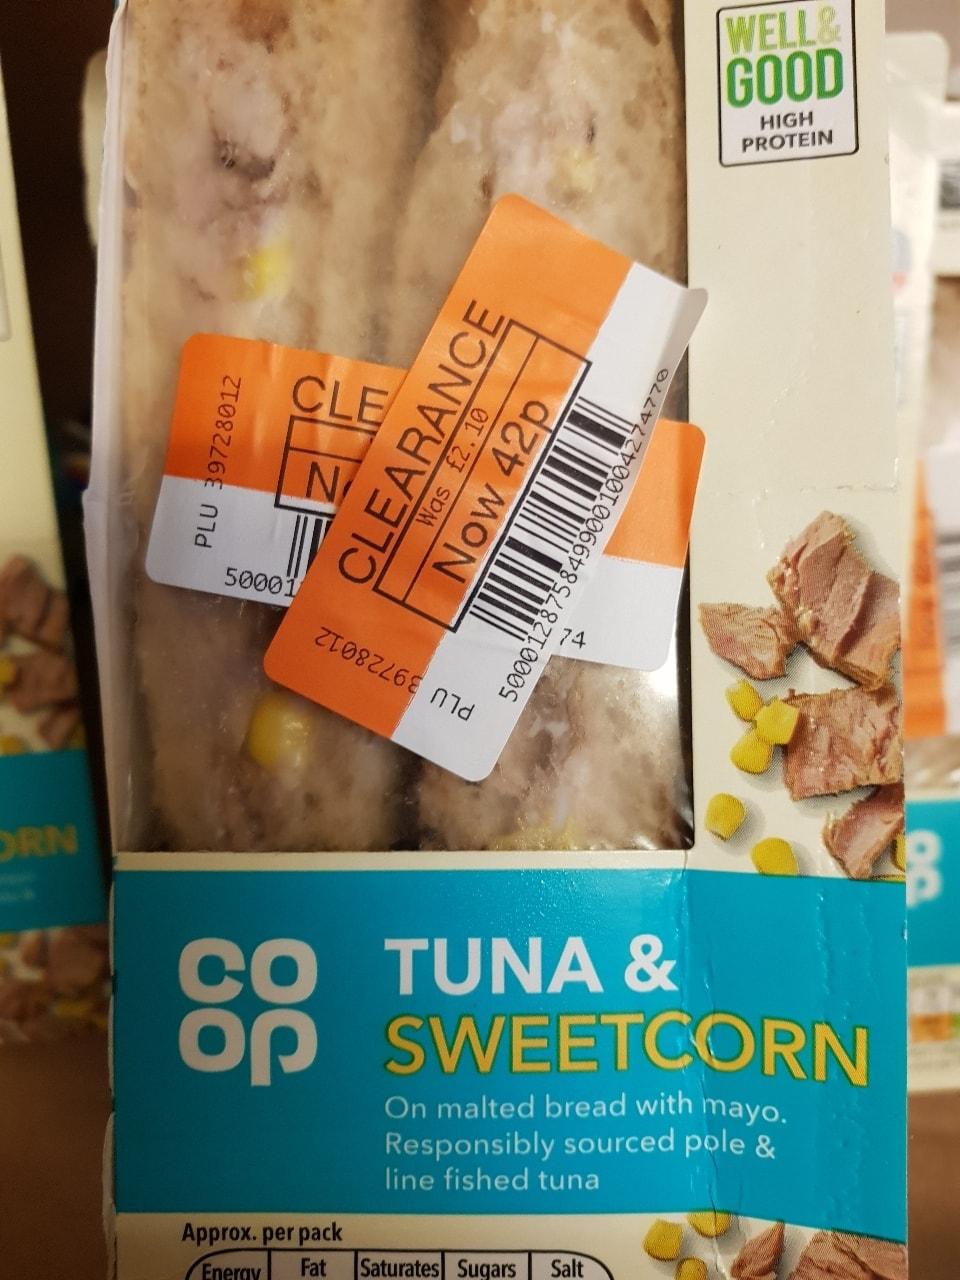 Tuna and sweetcorn sandwich